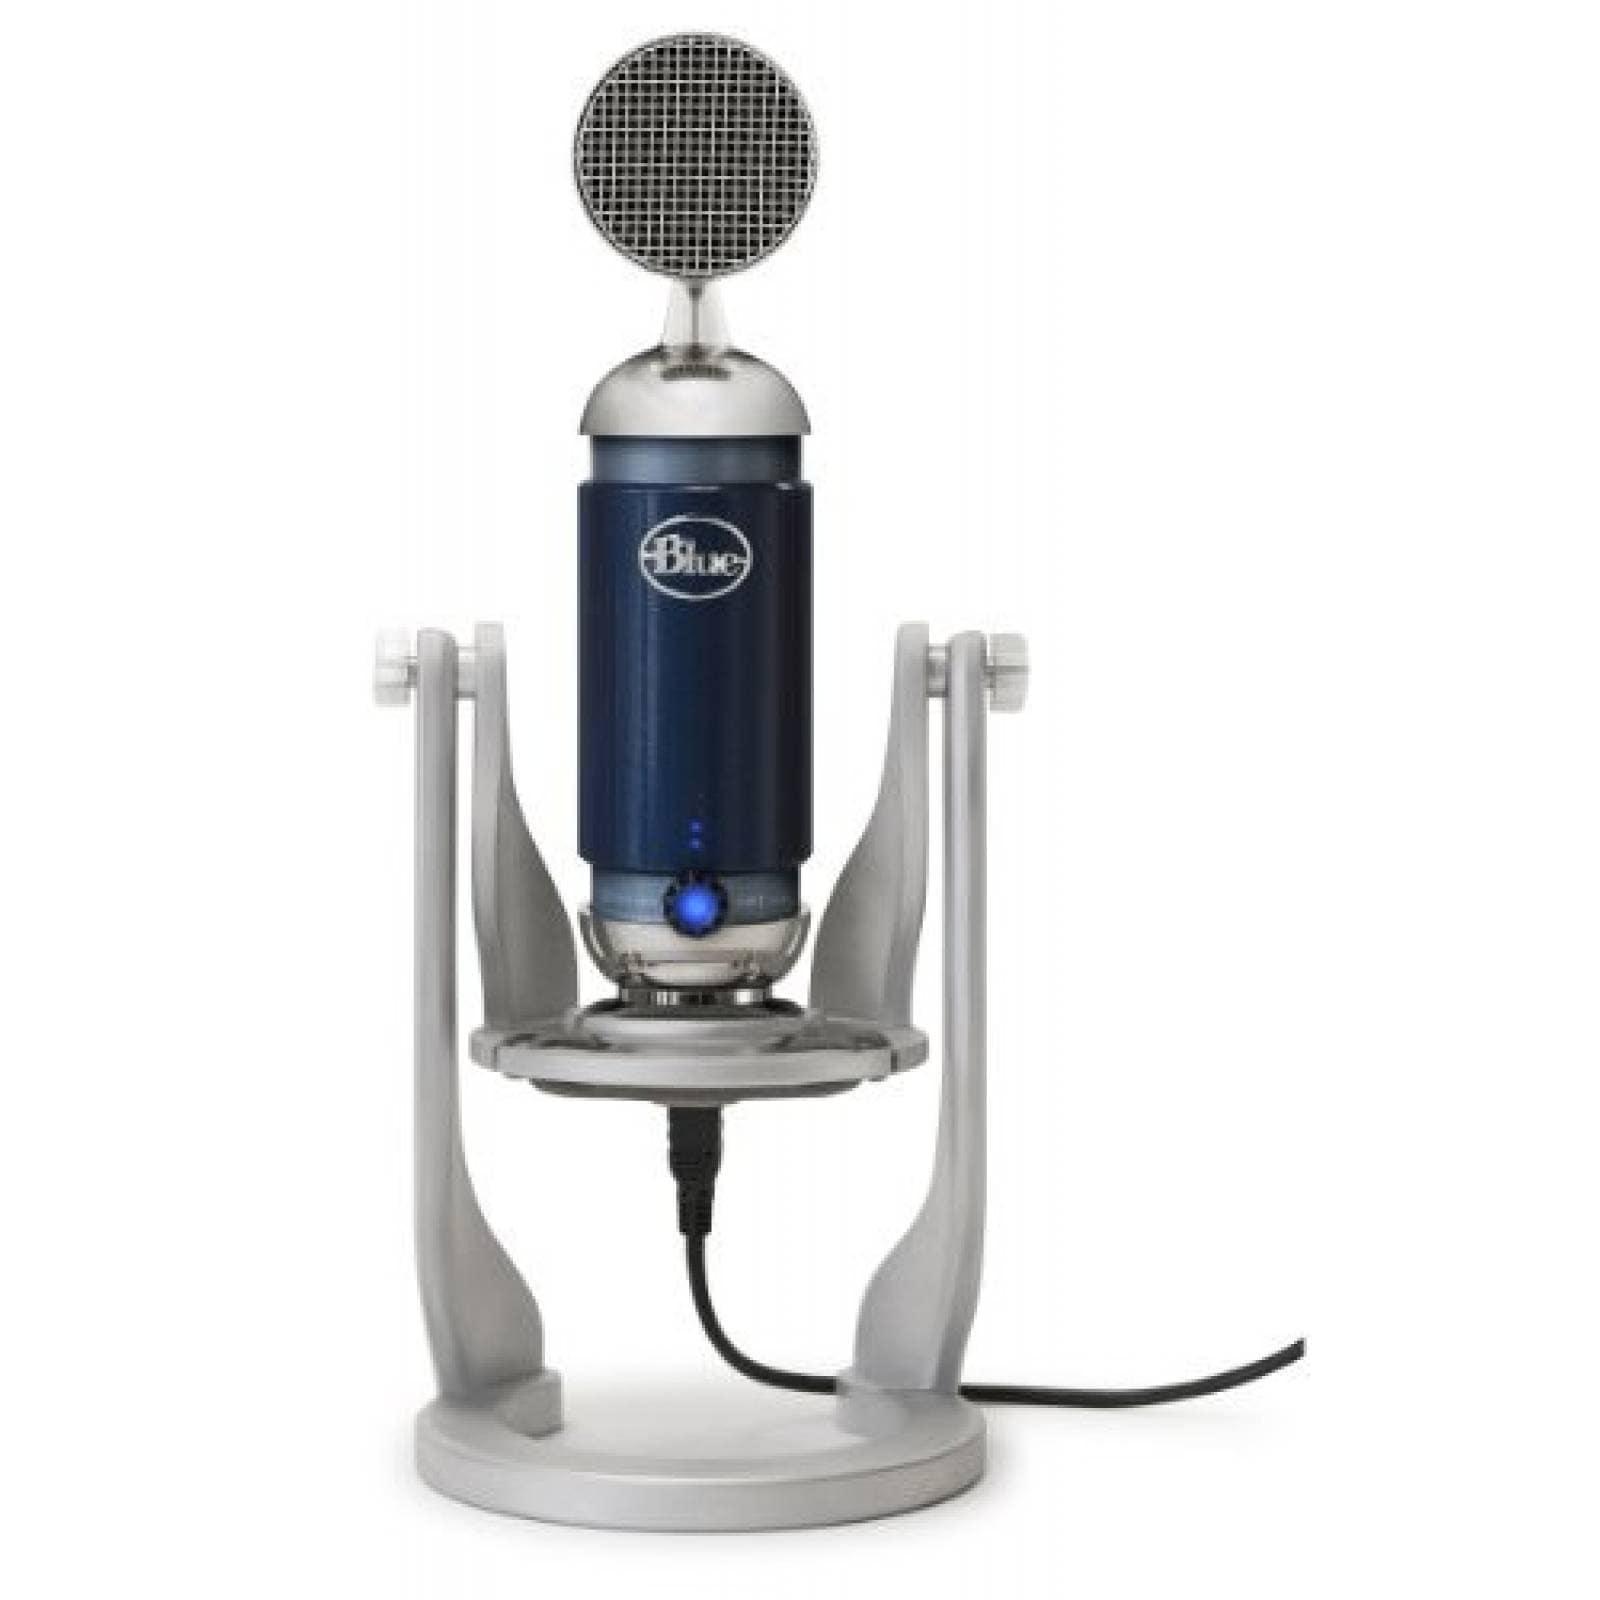 Micrófono Blue Spark Digital Lightning Condensador Cardioide